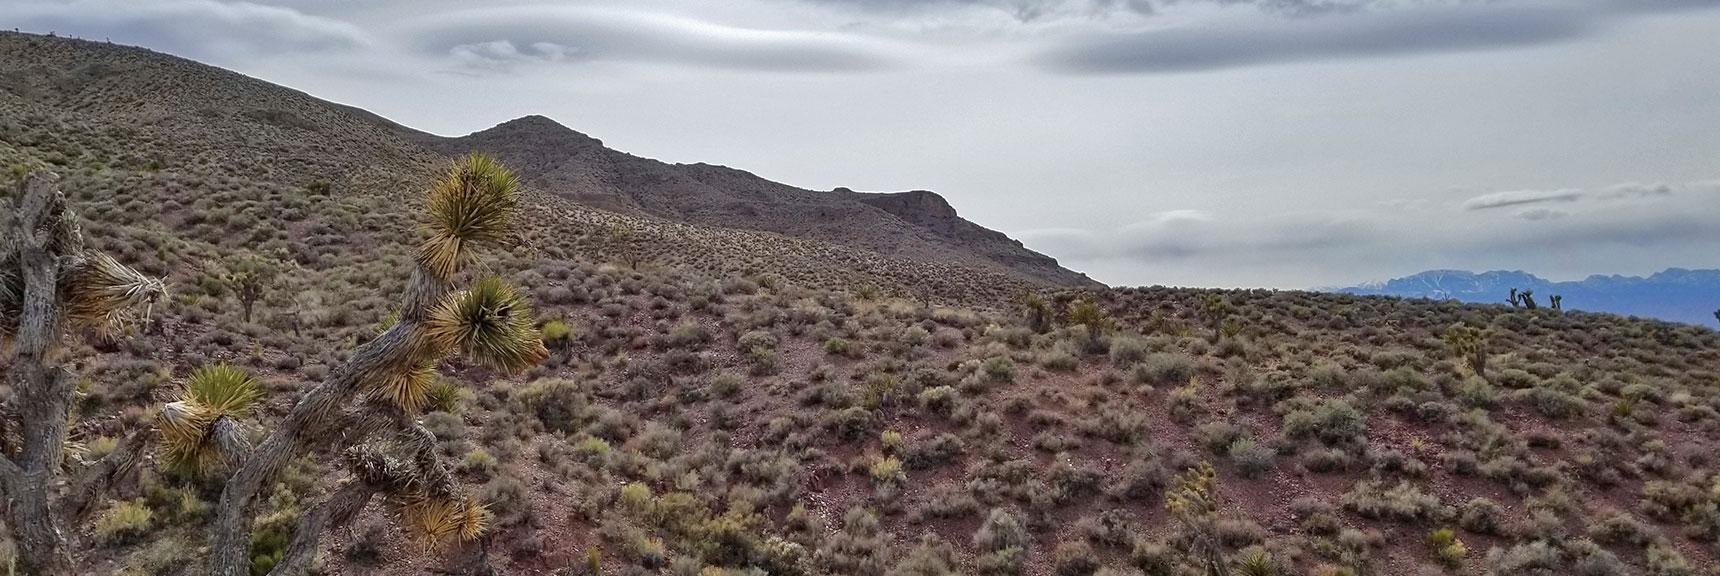 Heading Back West Along the Northern Base of Gass Peak | Gass Peak Eastern Summit Ultra-marathon Adventure, Nevada